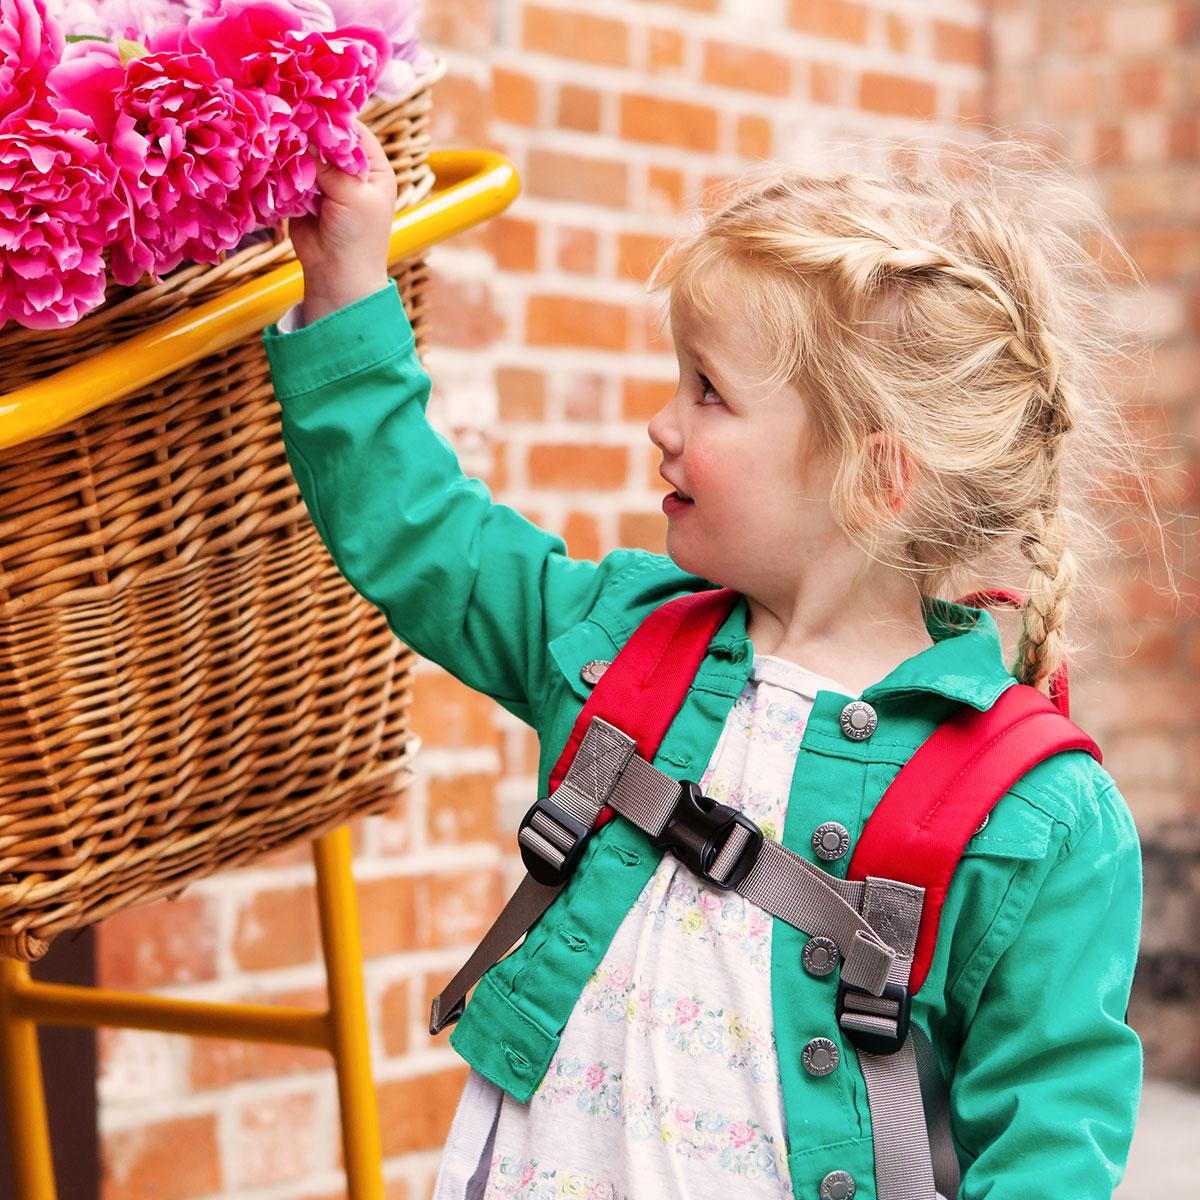 46dea4ac112d Kids Backpacks | Kids Rucksacks | LittleLife